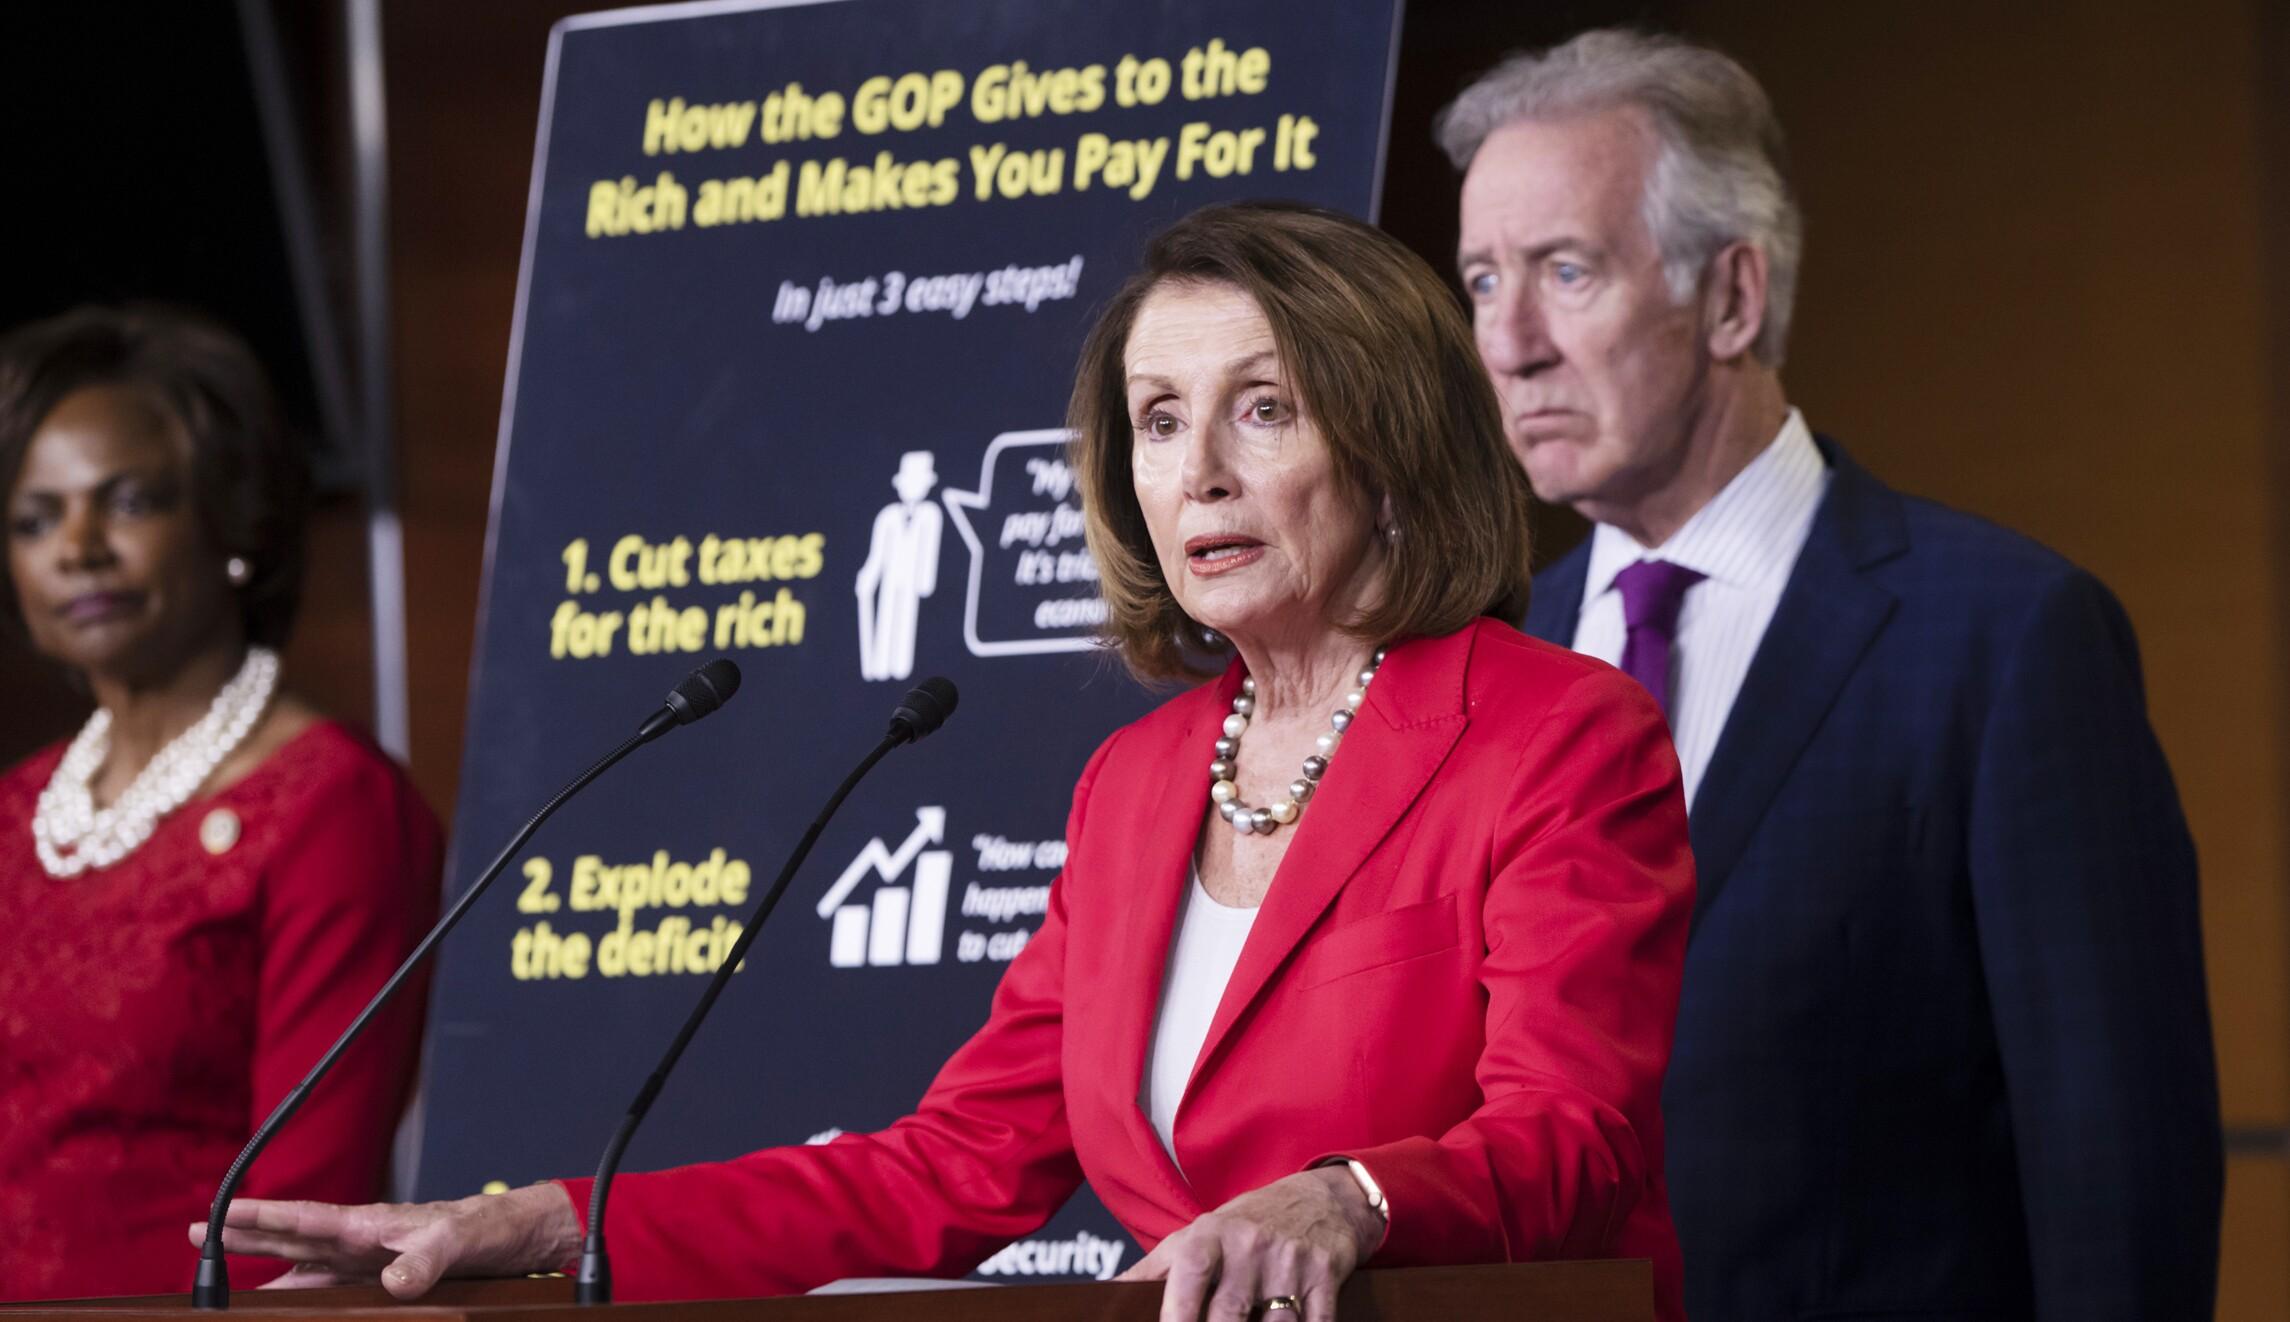 Trump eyes a tax break before 2020 election